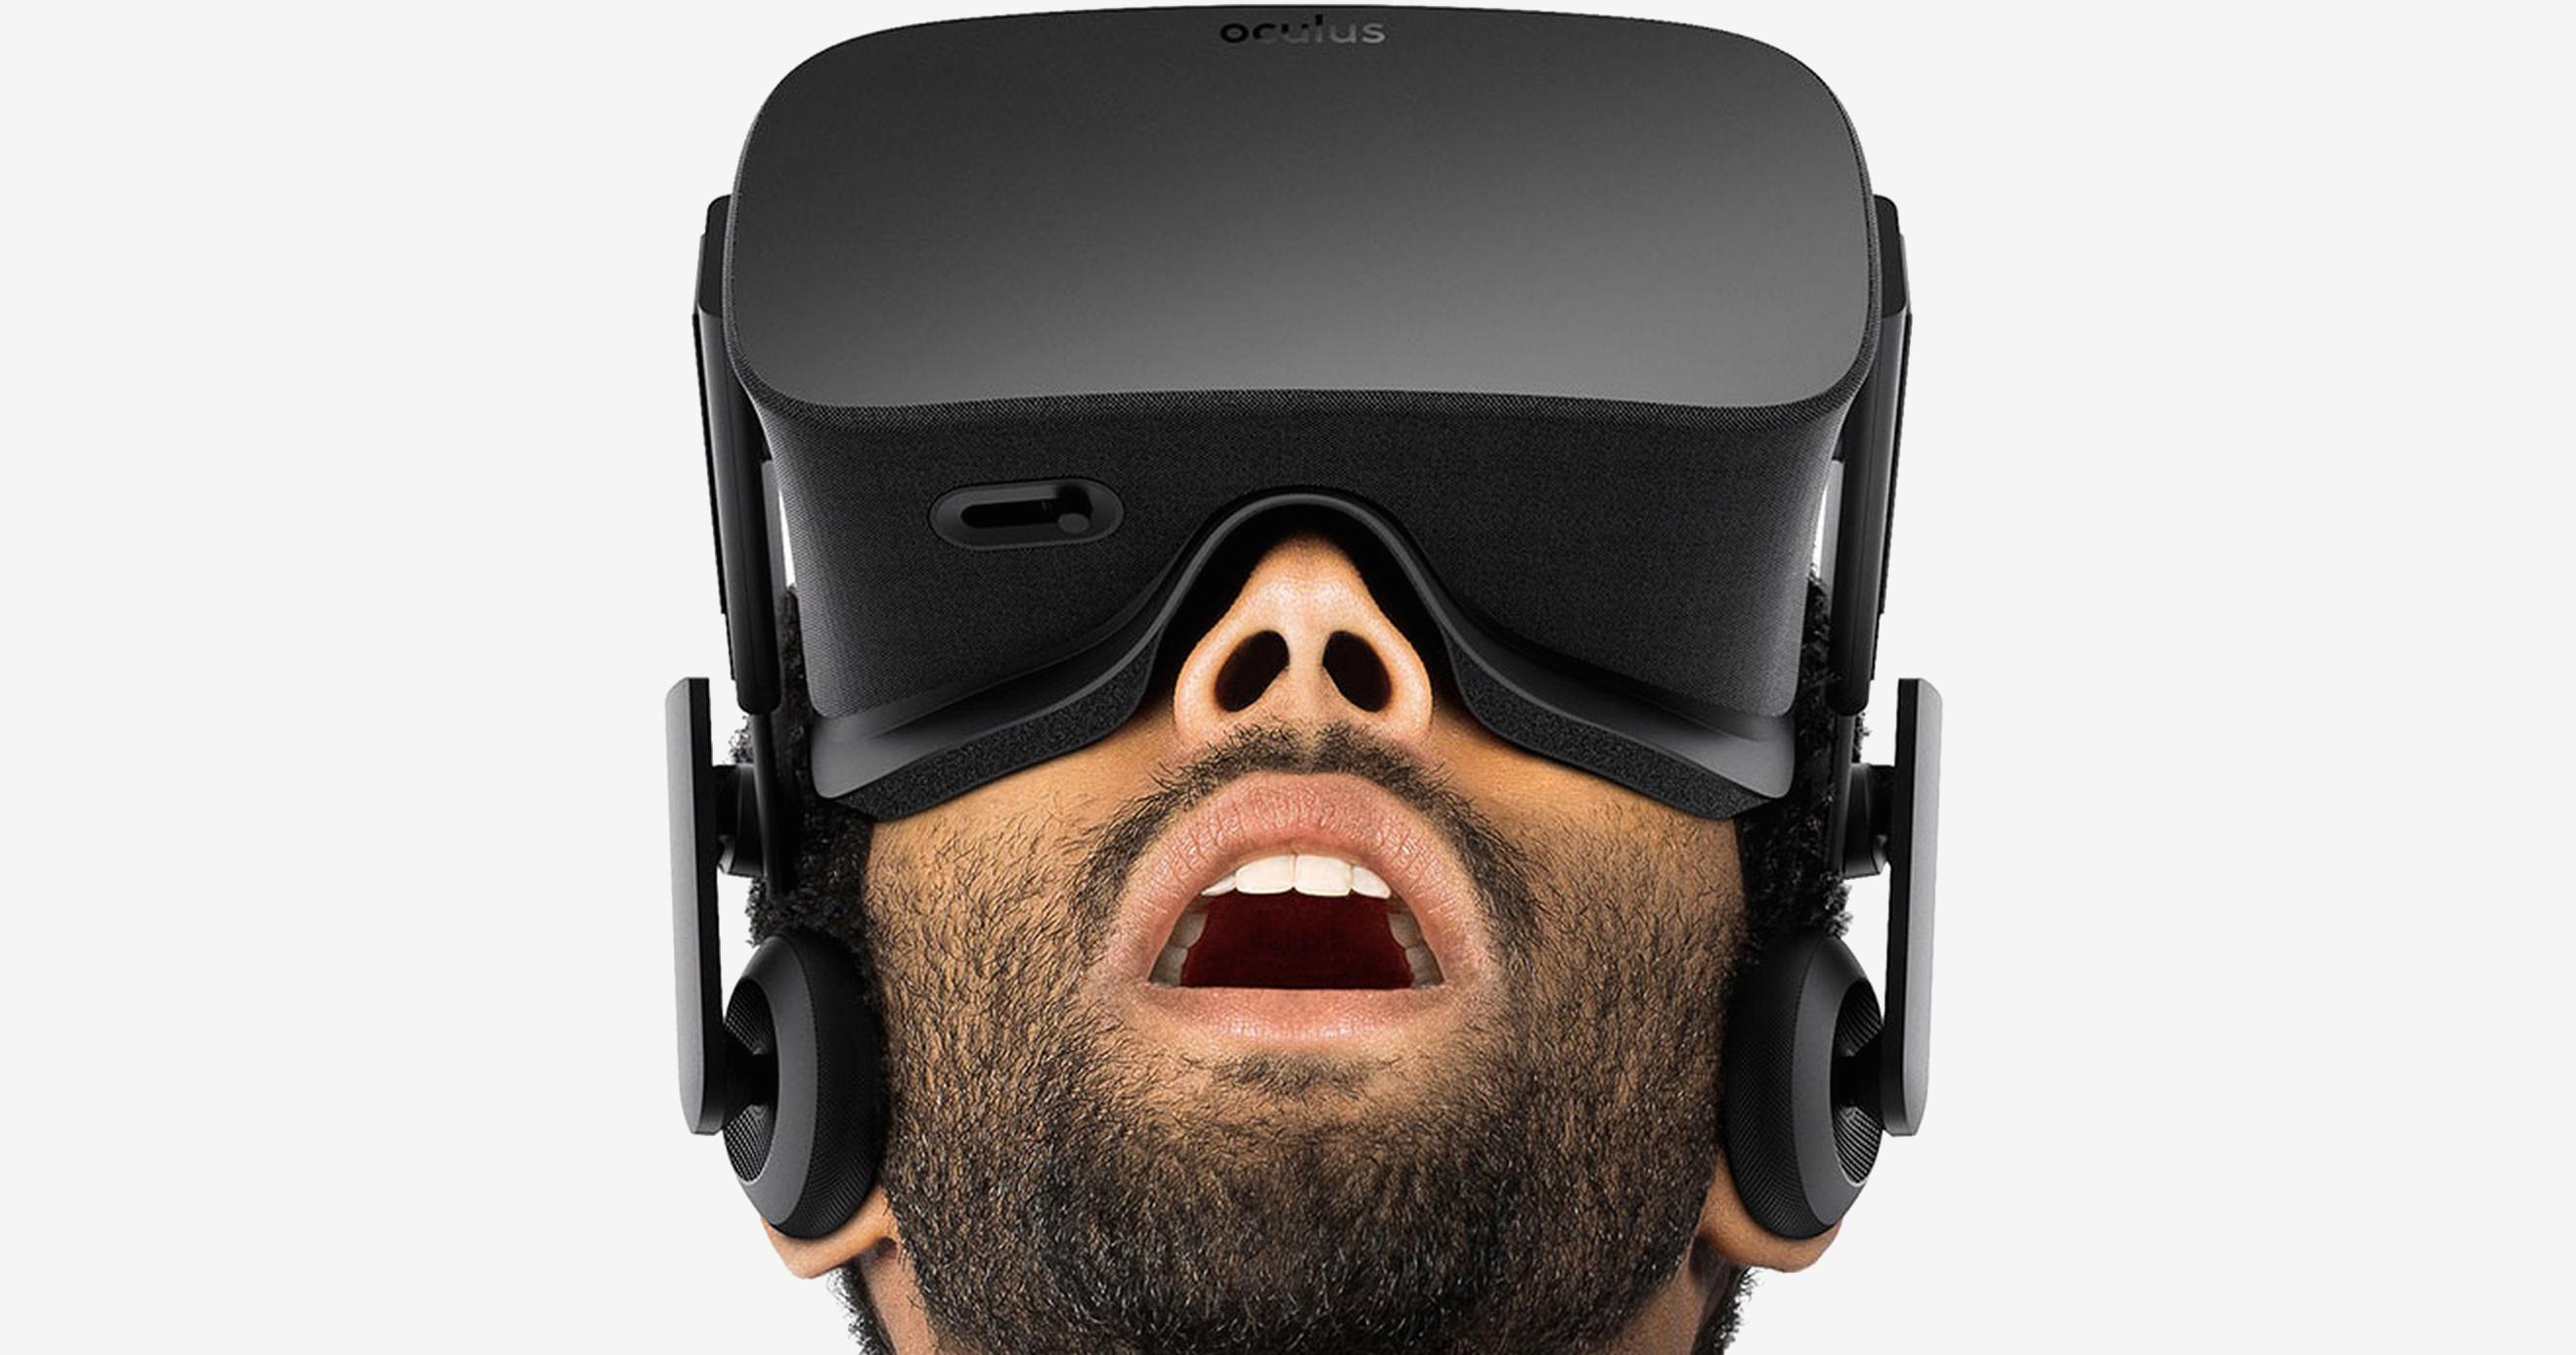 price cut, virtual reality, oculus rift, oculus, gdc 2017